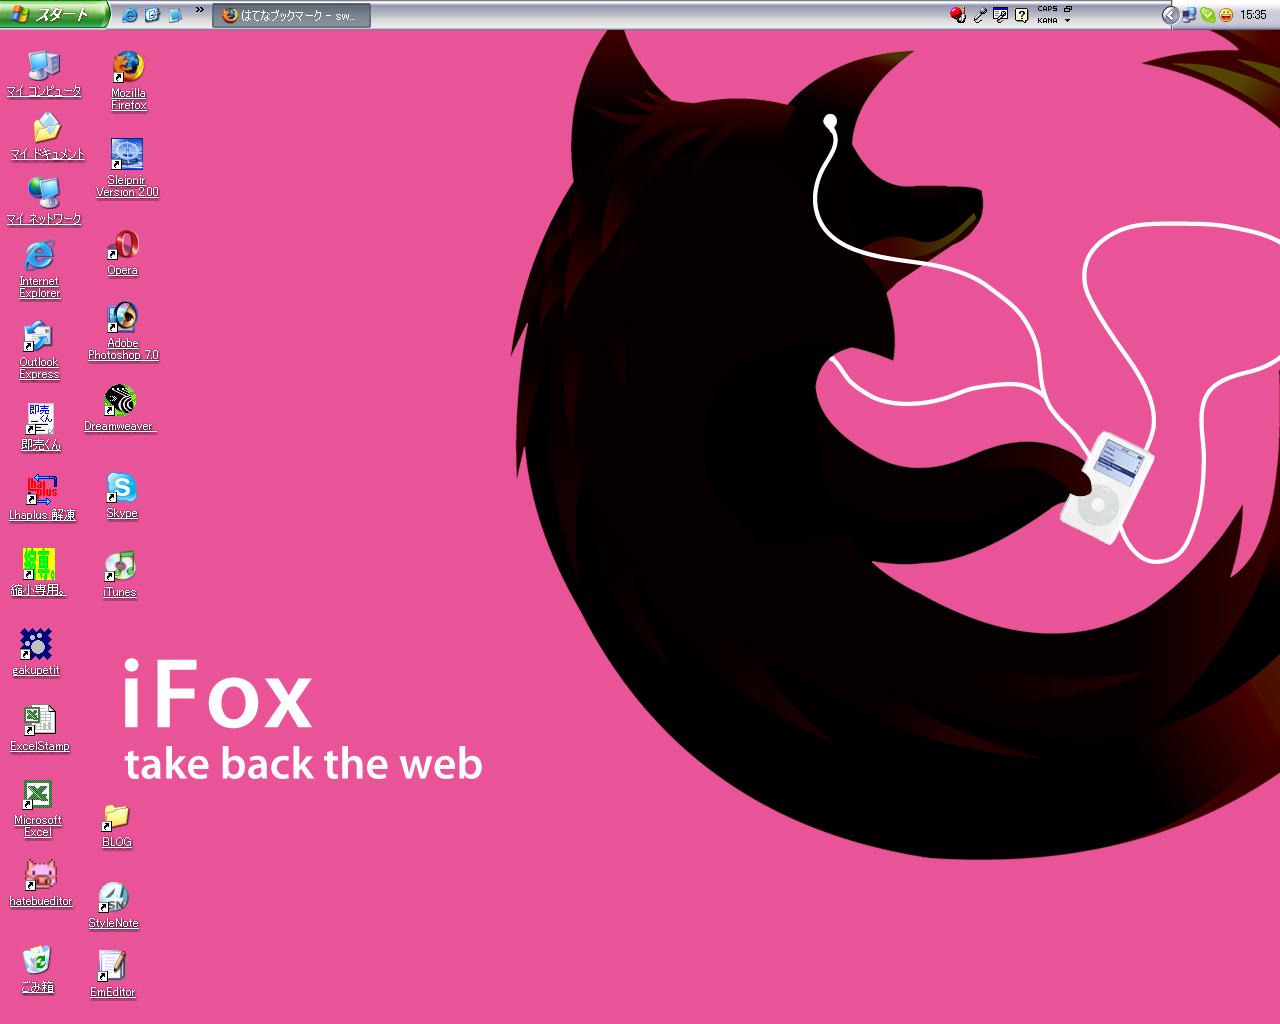 Ipod Firefoxの壁紙 Love Design